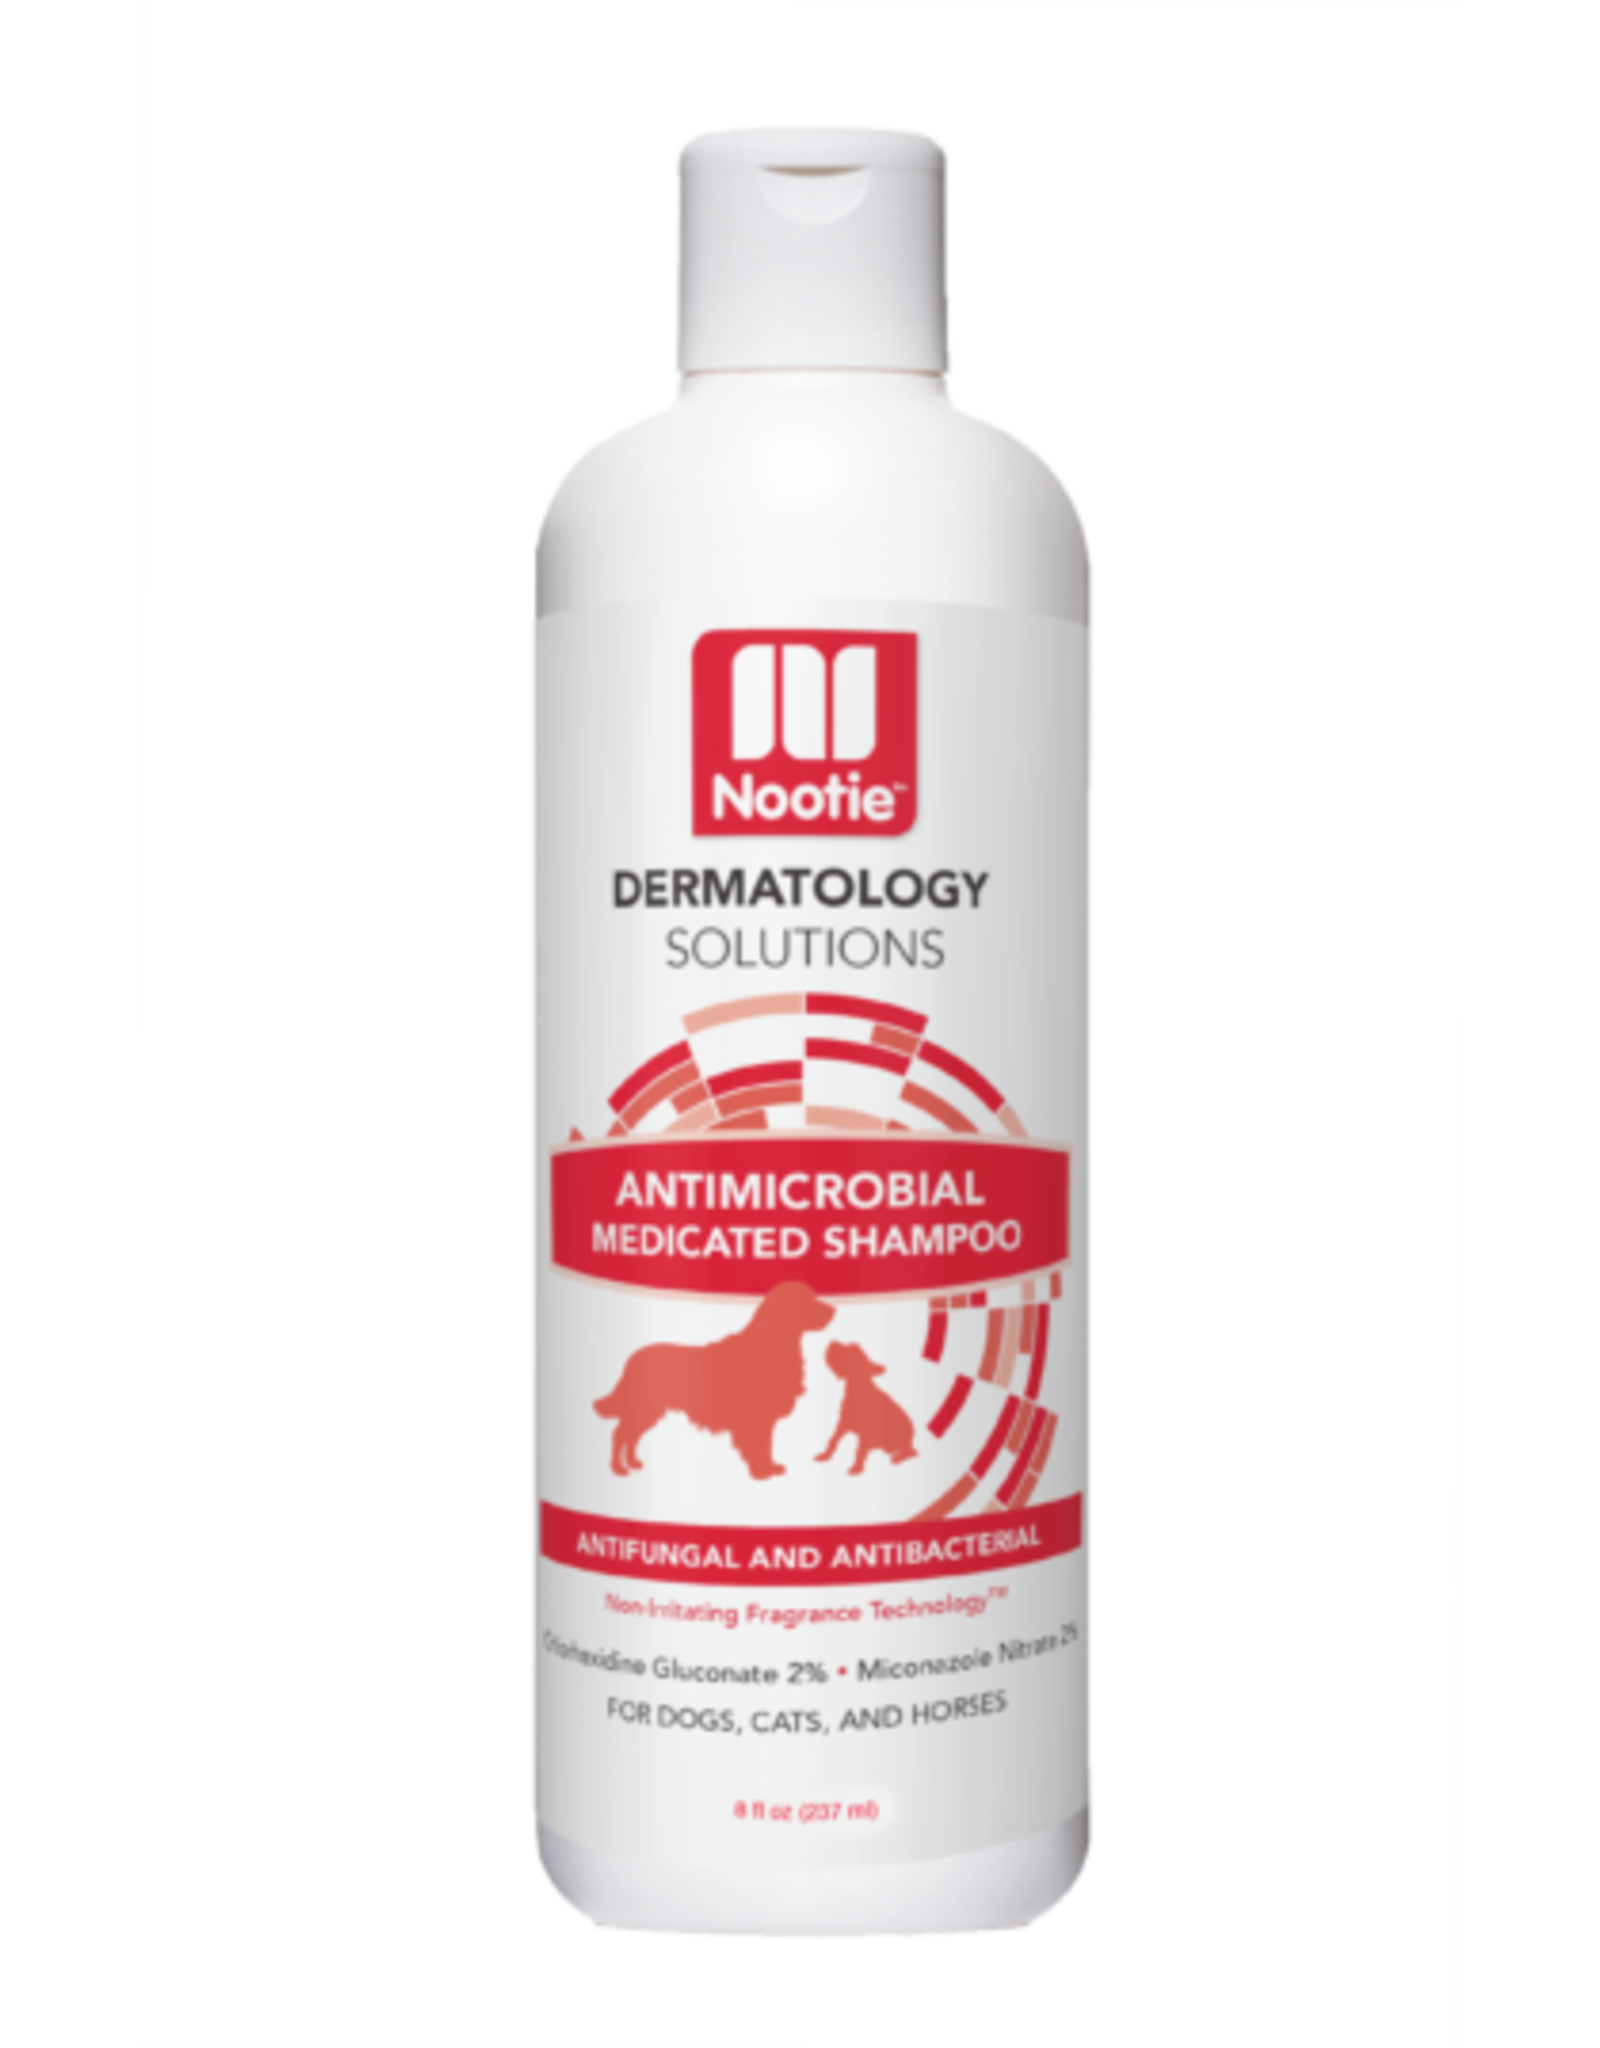 Nootie Nootie Dog & Cat Antimicrobial Shampoo 8oz